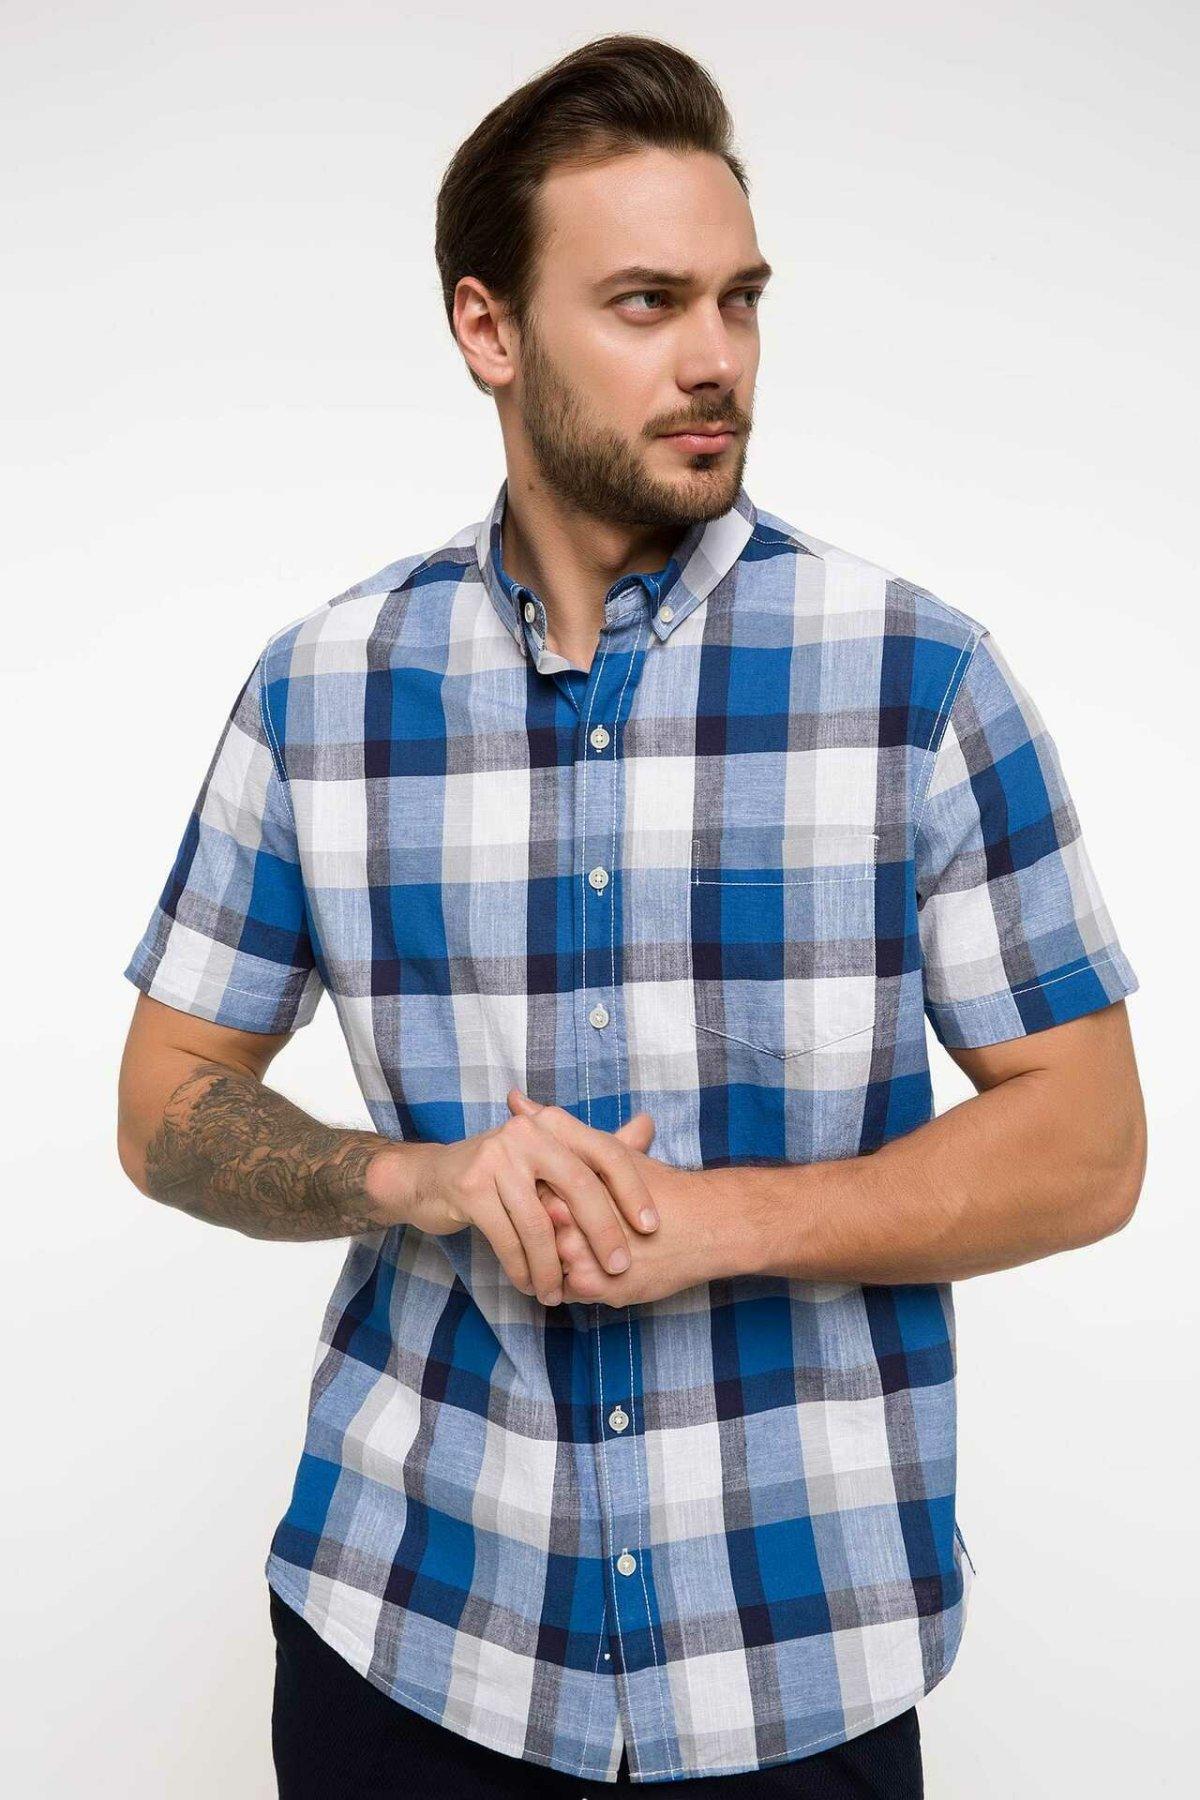 DeFacto Fashion Male Lapel Short Plaid Sleeve Shirt Men's Casual High Quality Loose Shirts Men Leisure Autumn New - I7838AZ18SM